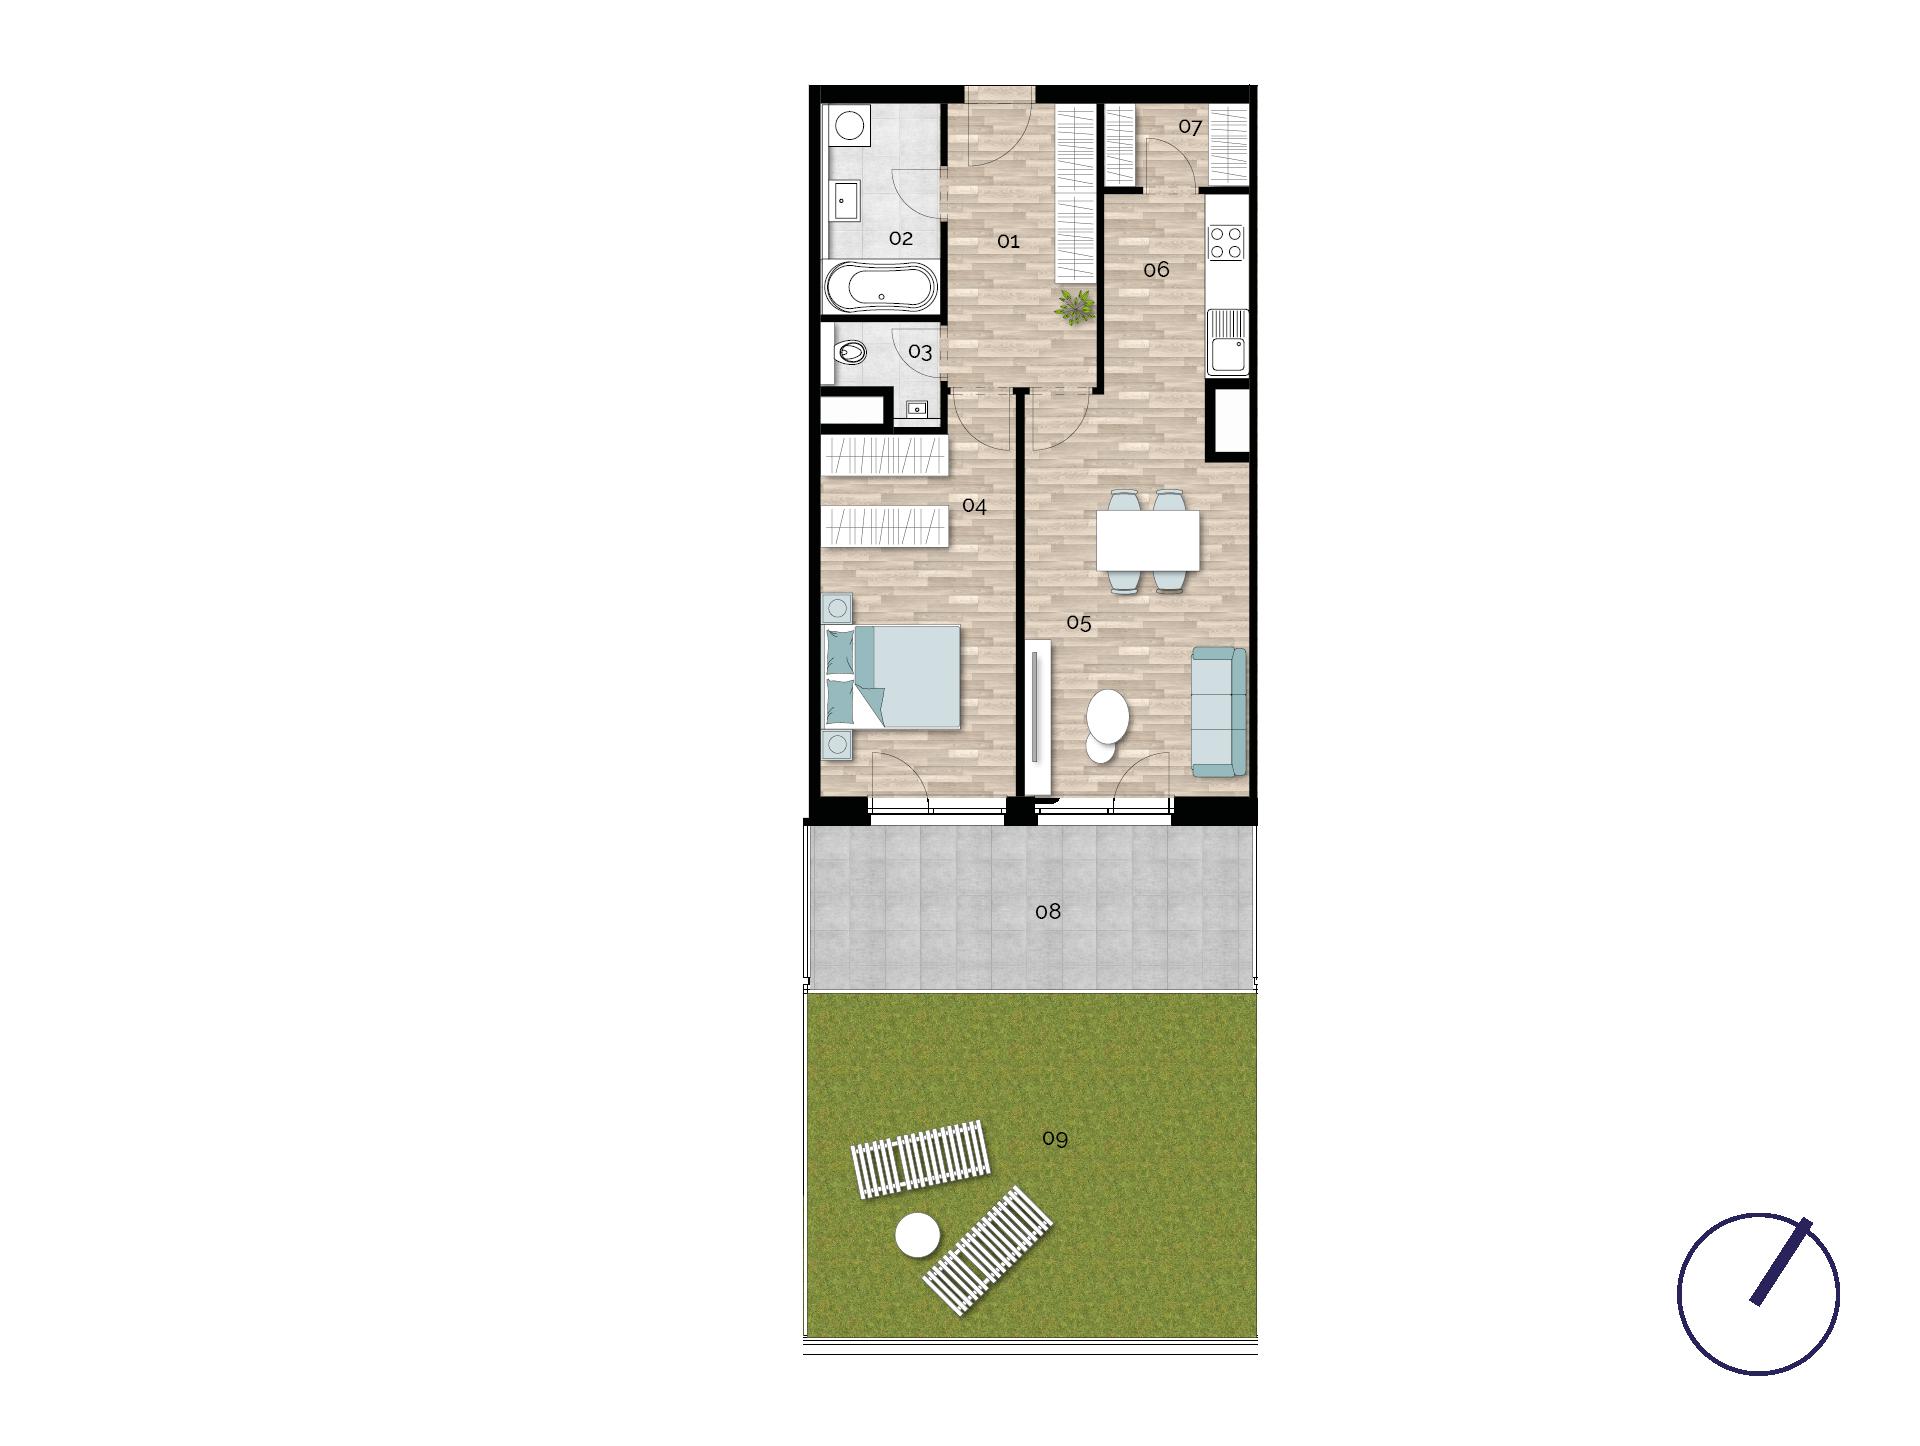 Detail Nemovitosti - Rezidence U Rokytky, Praha 9 1B4 / 1. NP